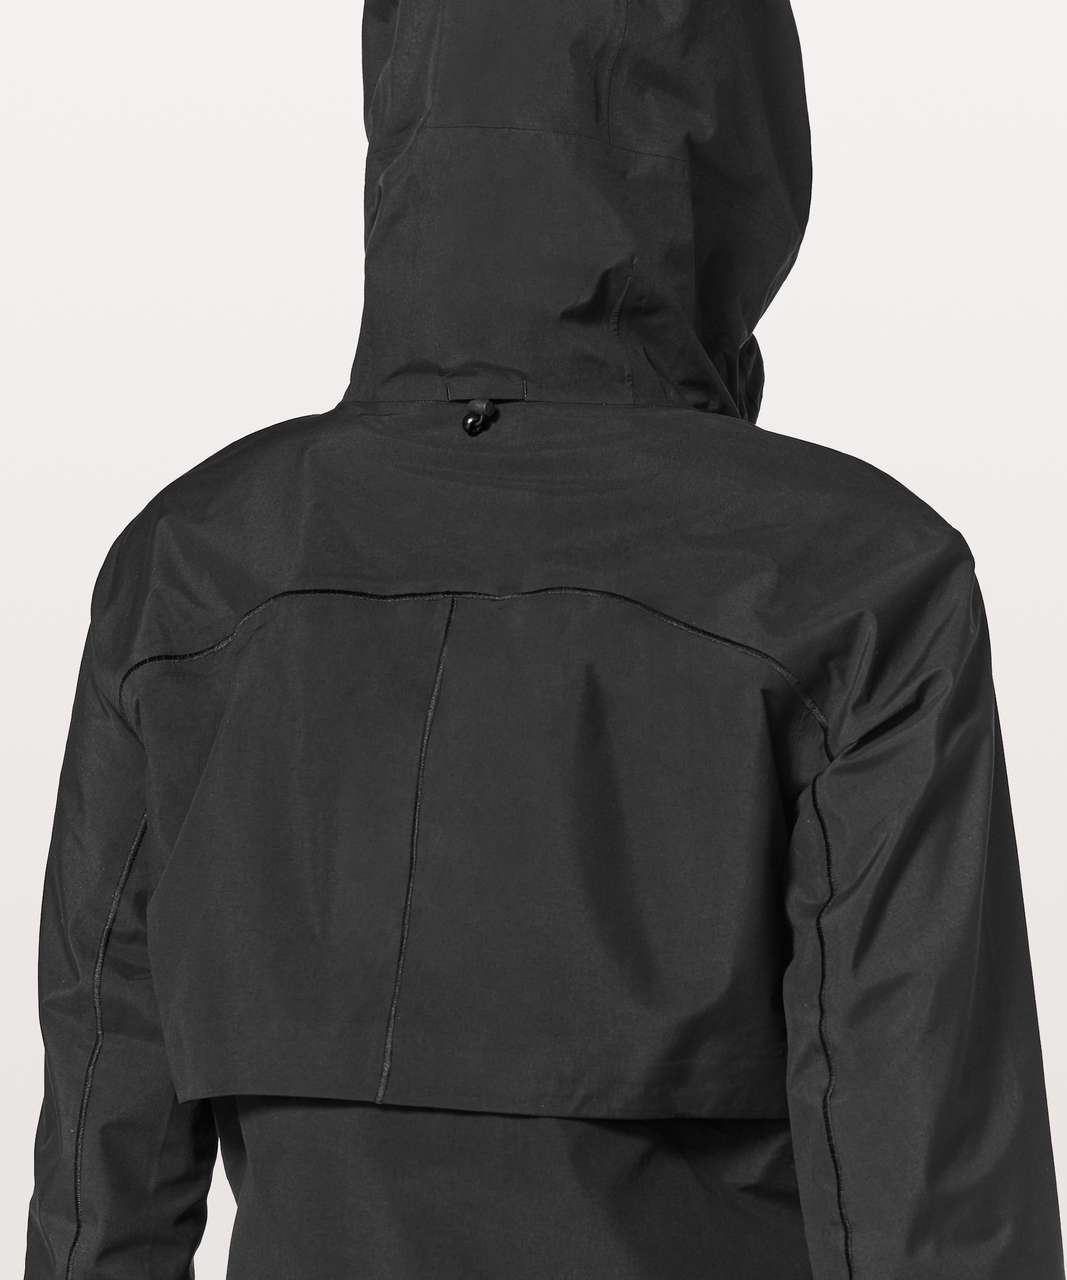 Lululemon Cloud Crush Jacket - Black